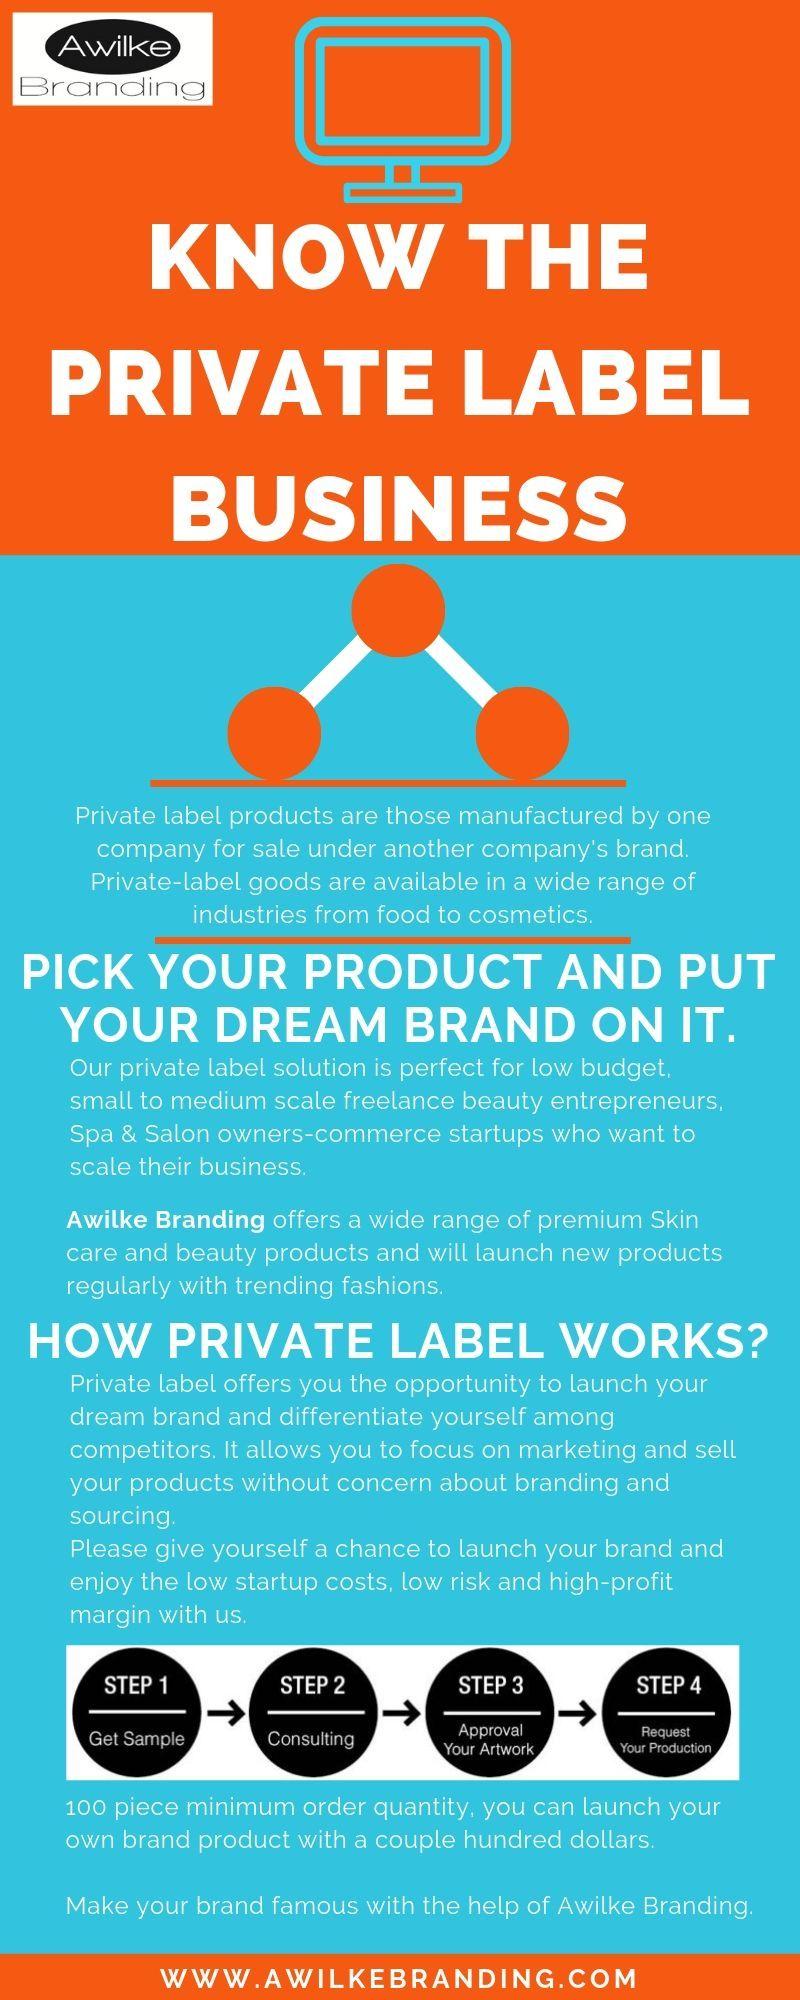 Best Private Label Business Awilke Branding Private Label Private Label Skin Care Branding